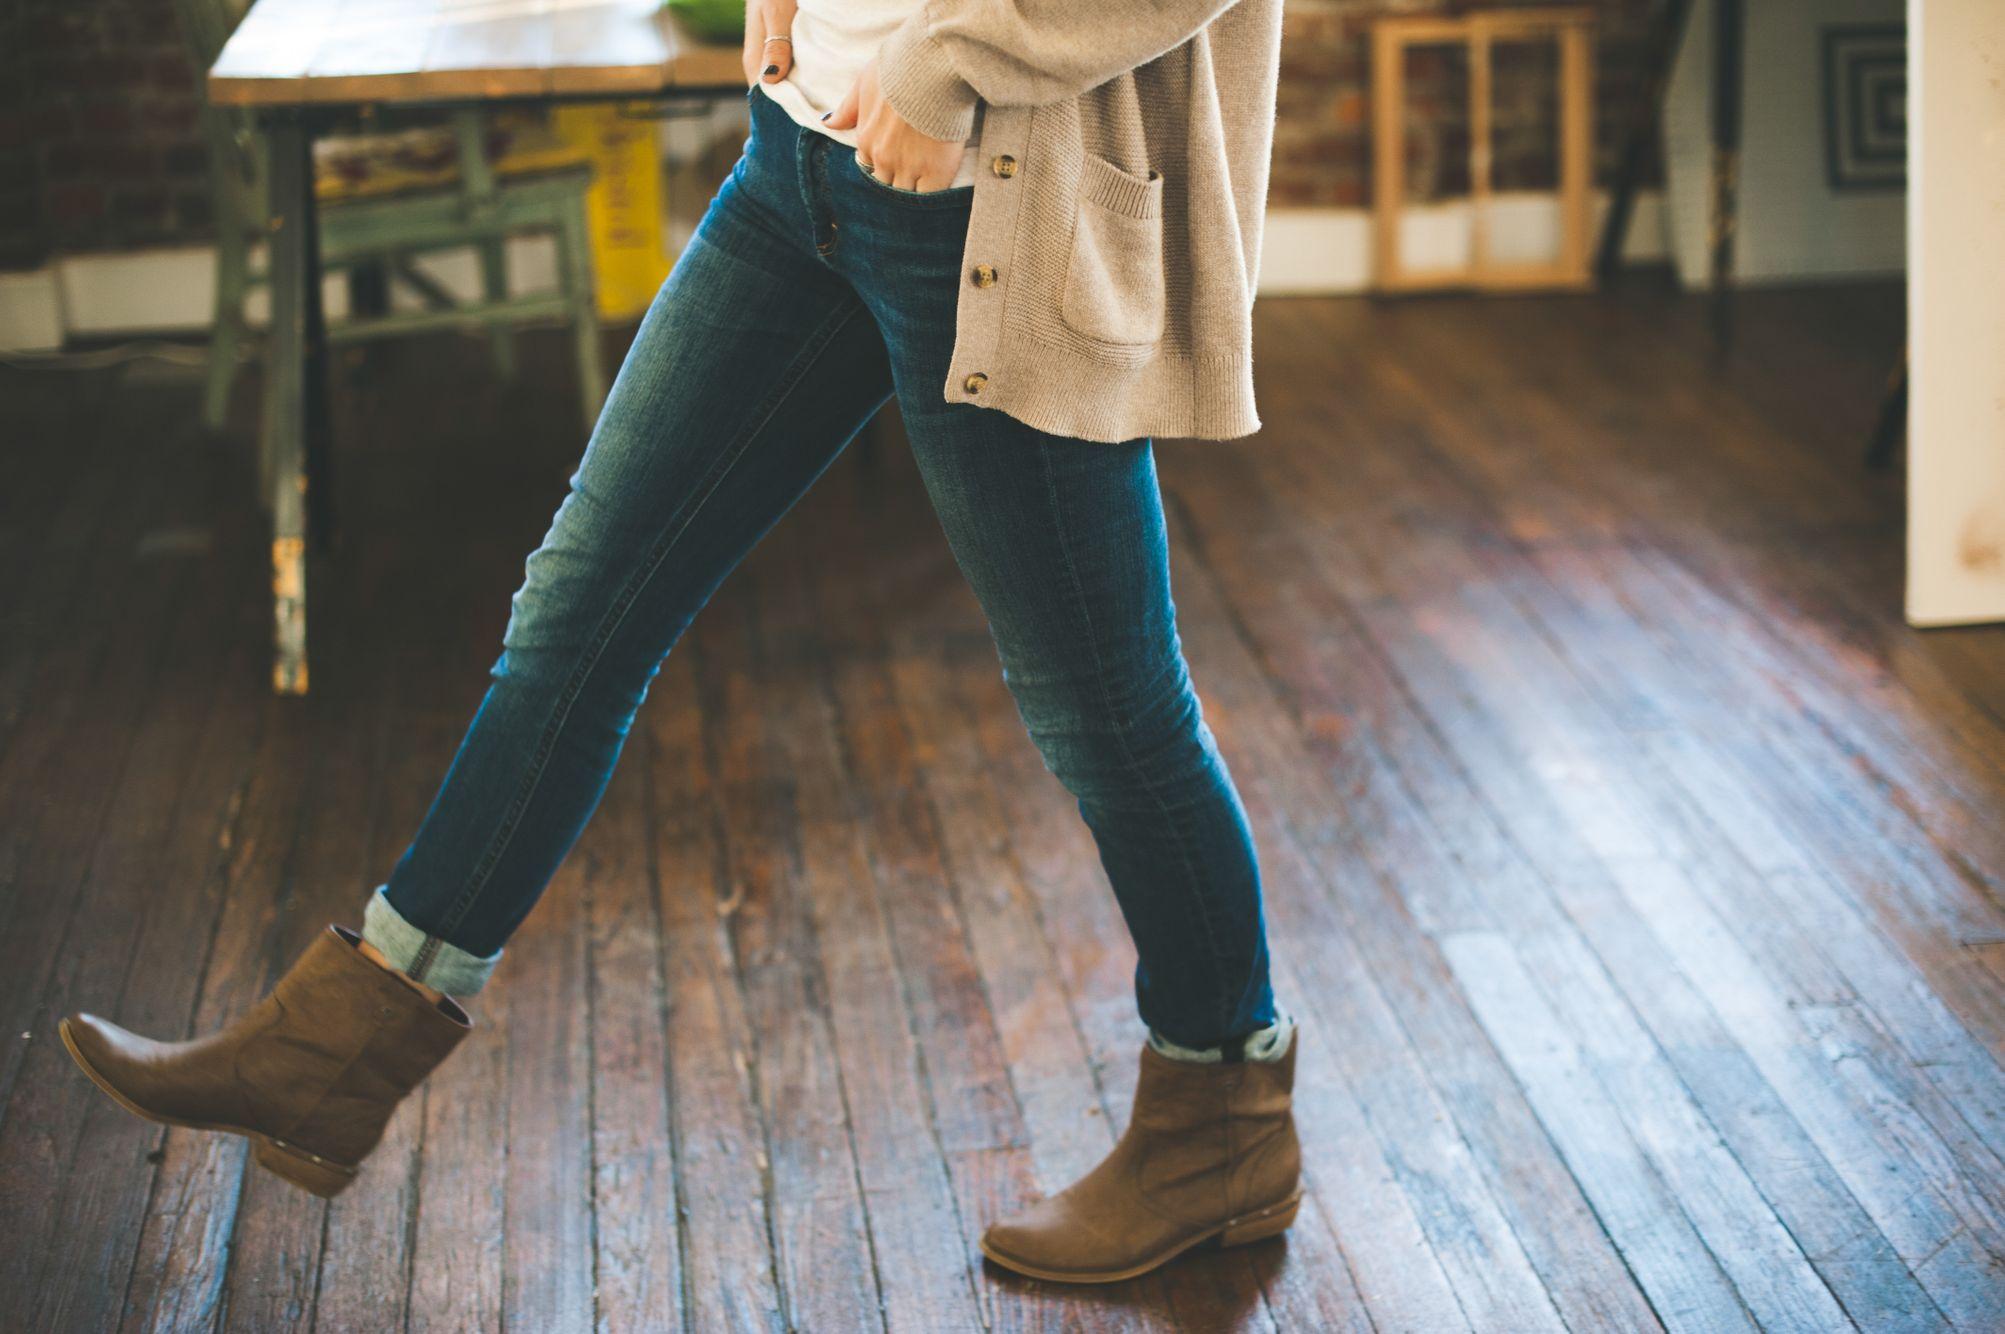 cowboy boots dancing